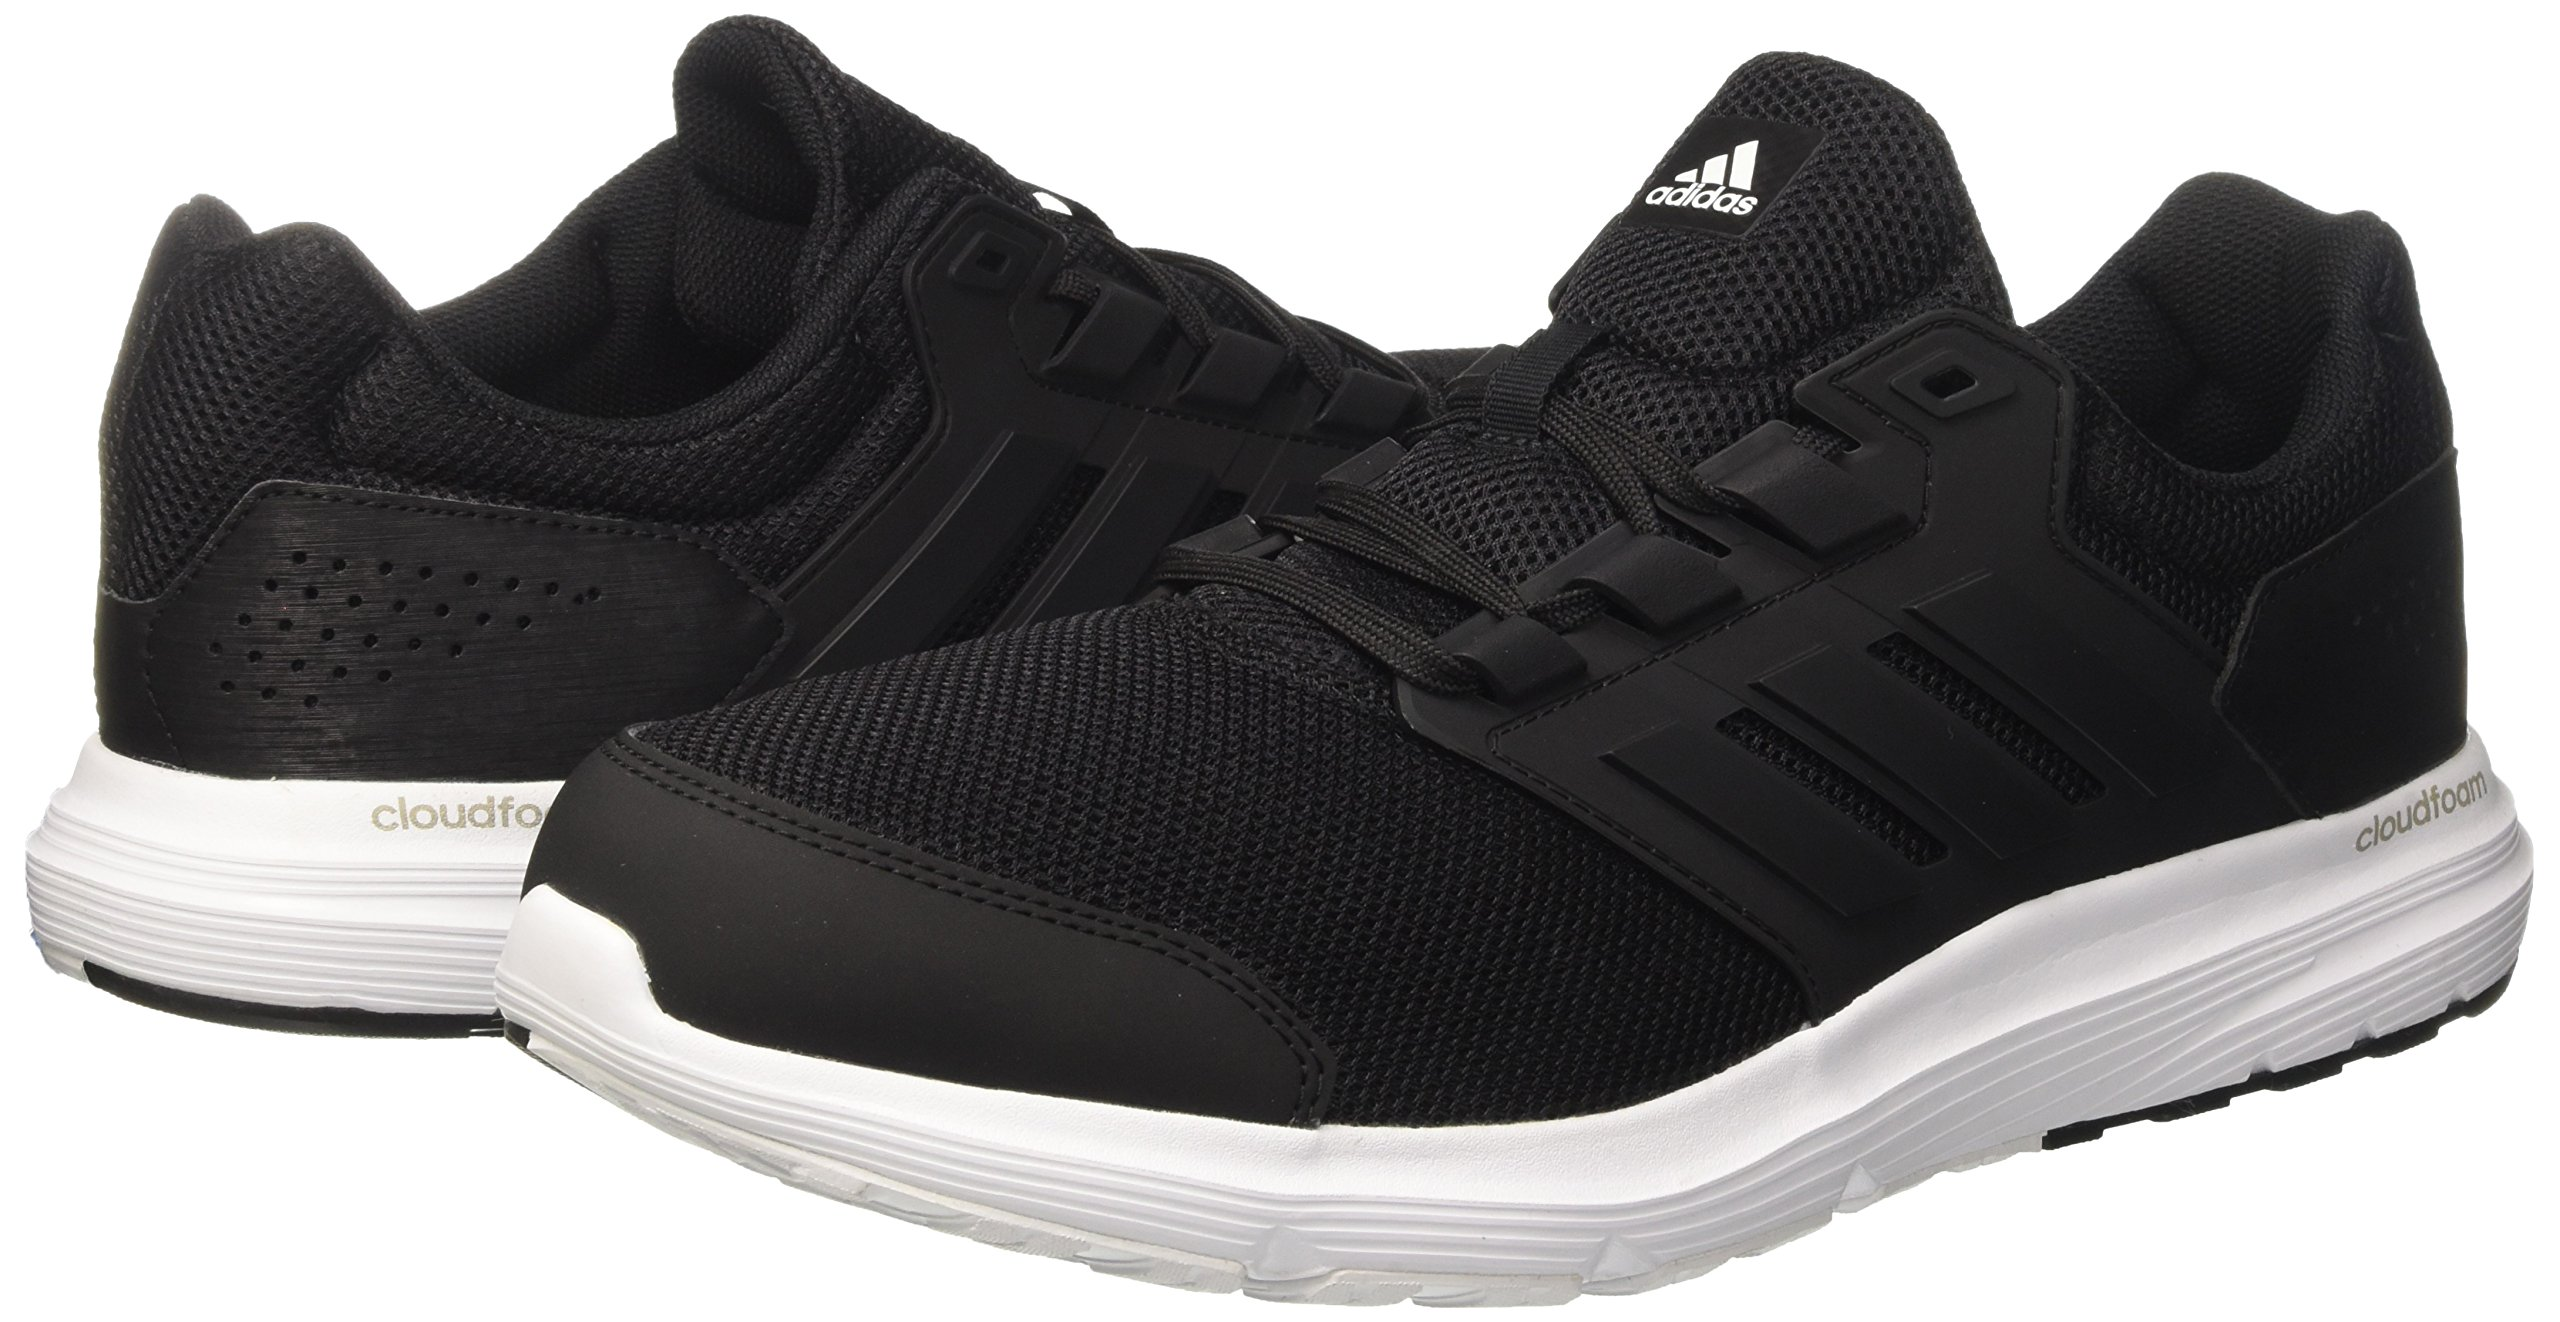 Adidas Galaxy 4 M, Scarpe da Running Uomo 5 spesavip